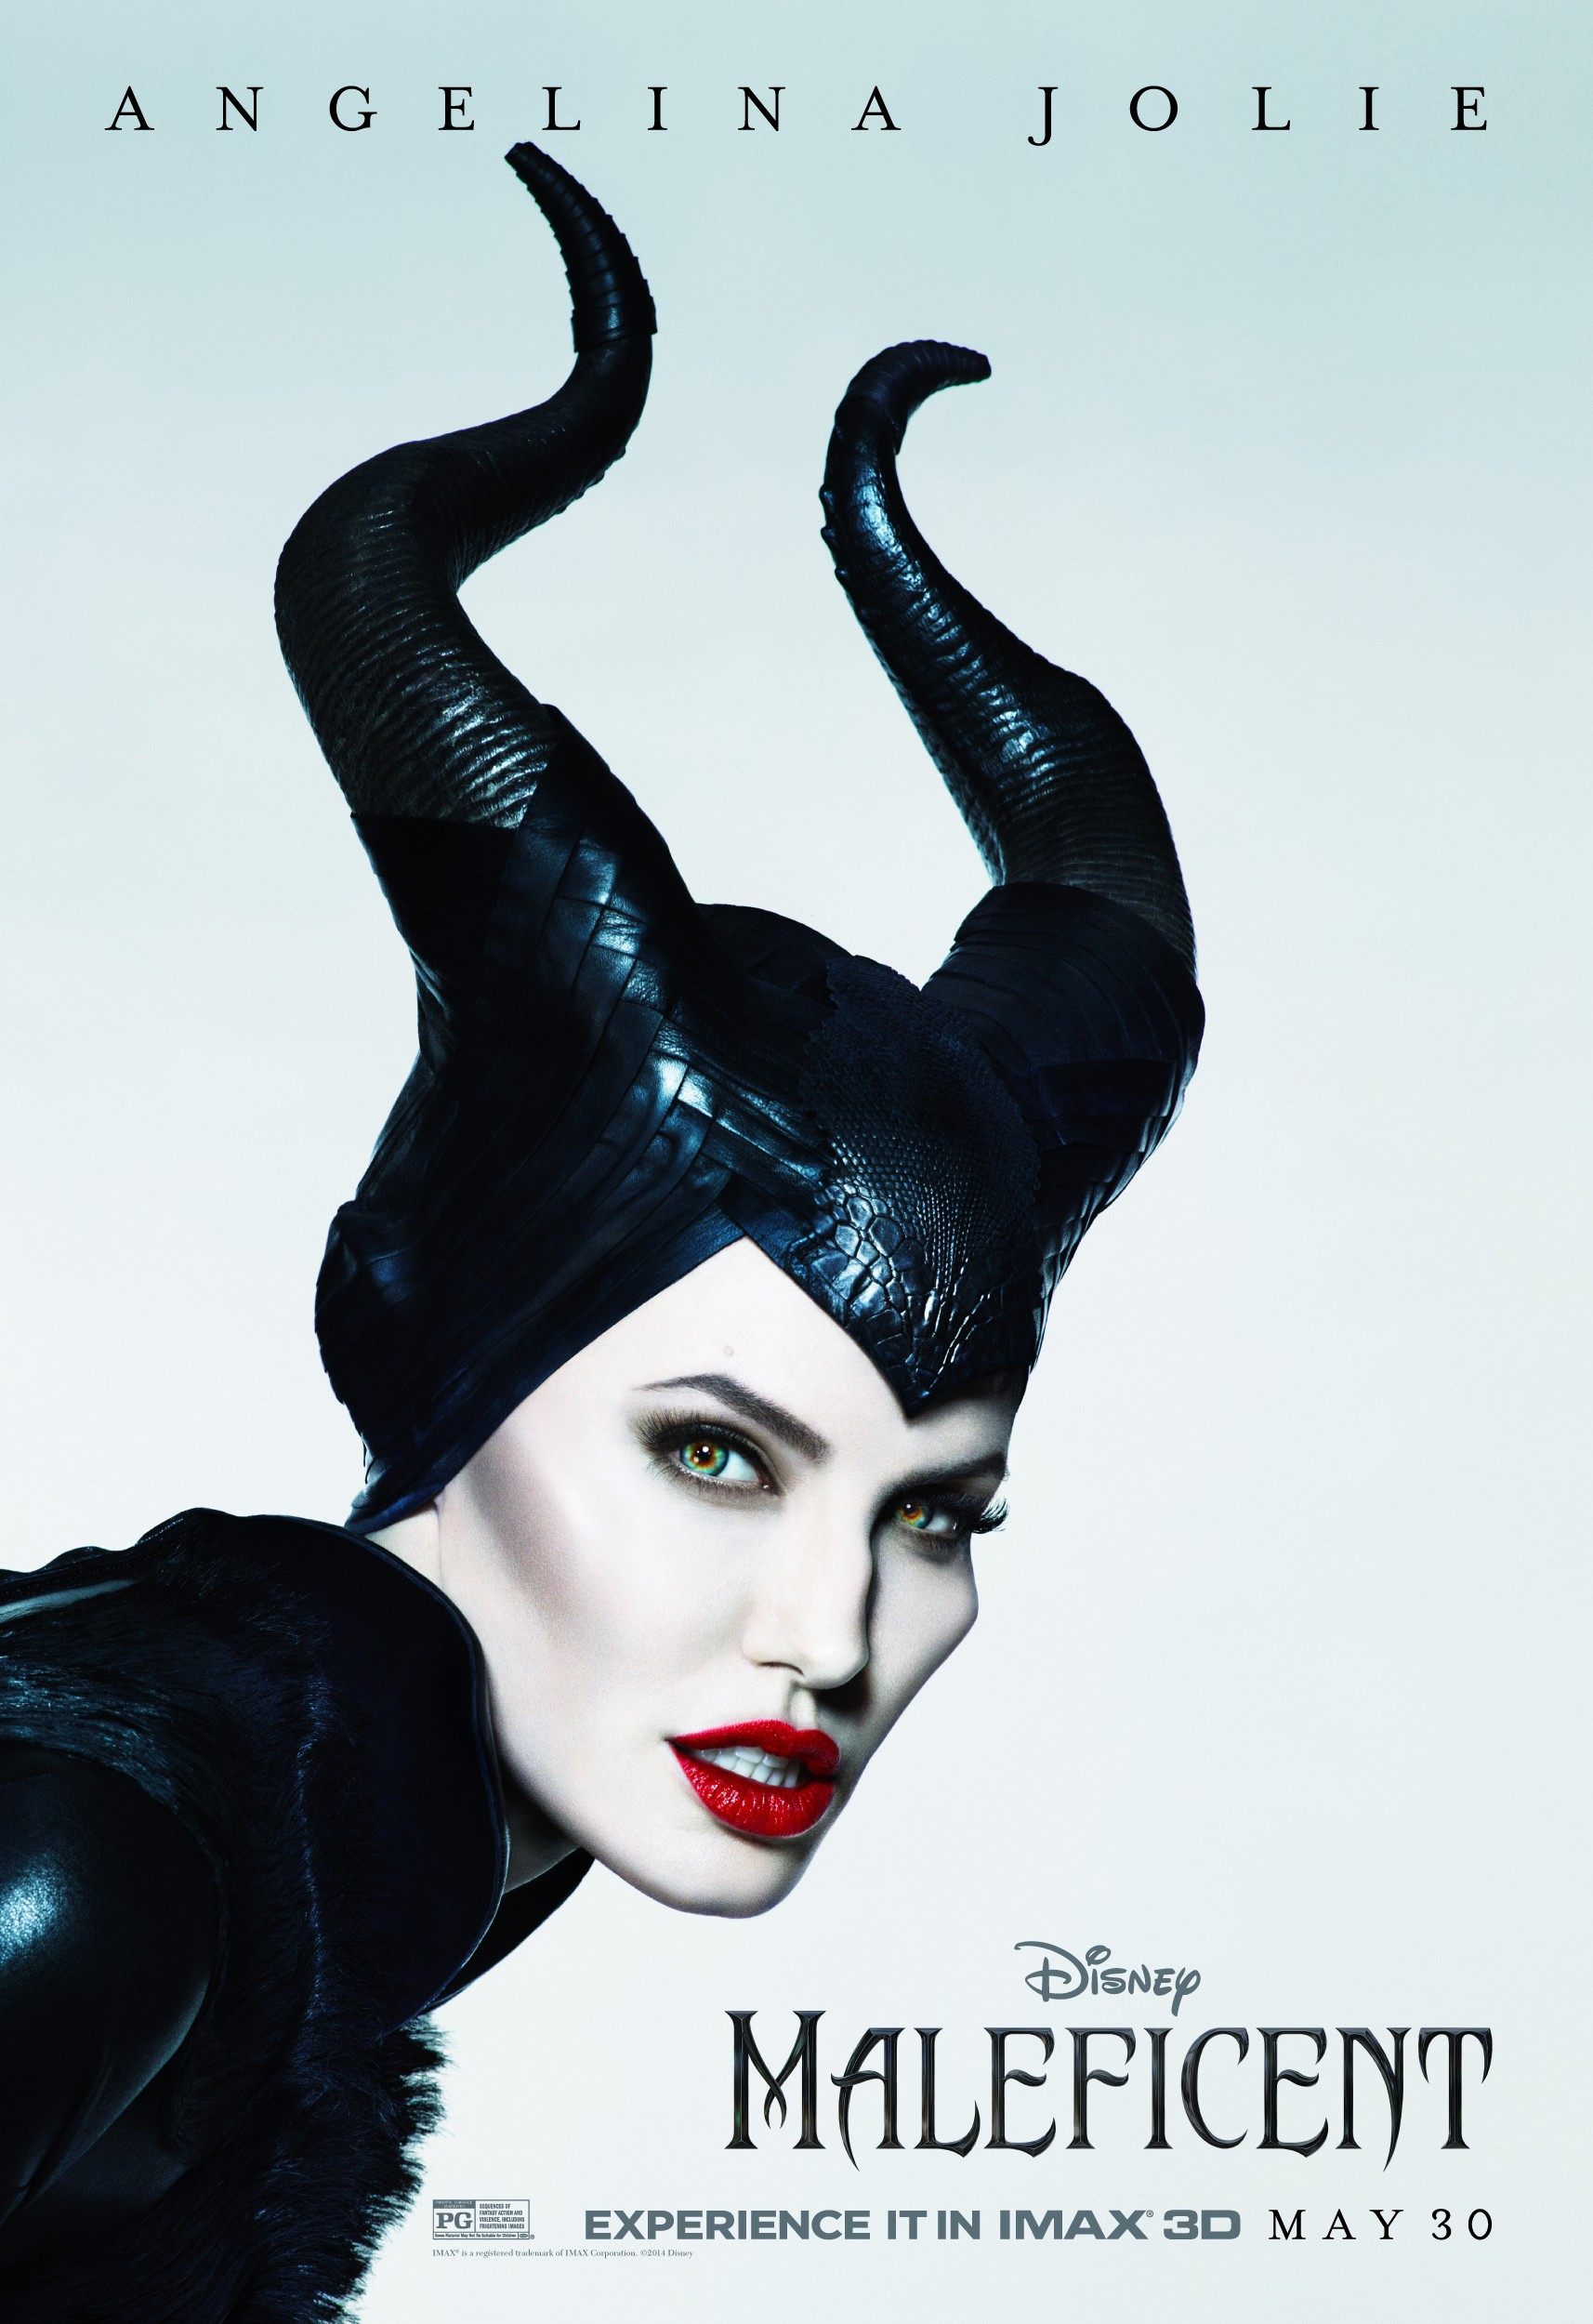 Amazon.com: Maleficent (2014) 12X18 Movie Poster (THICK ...